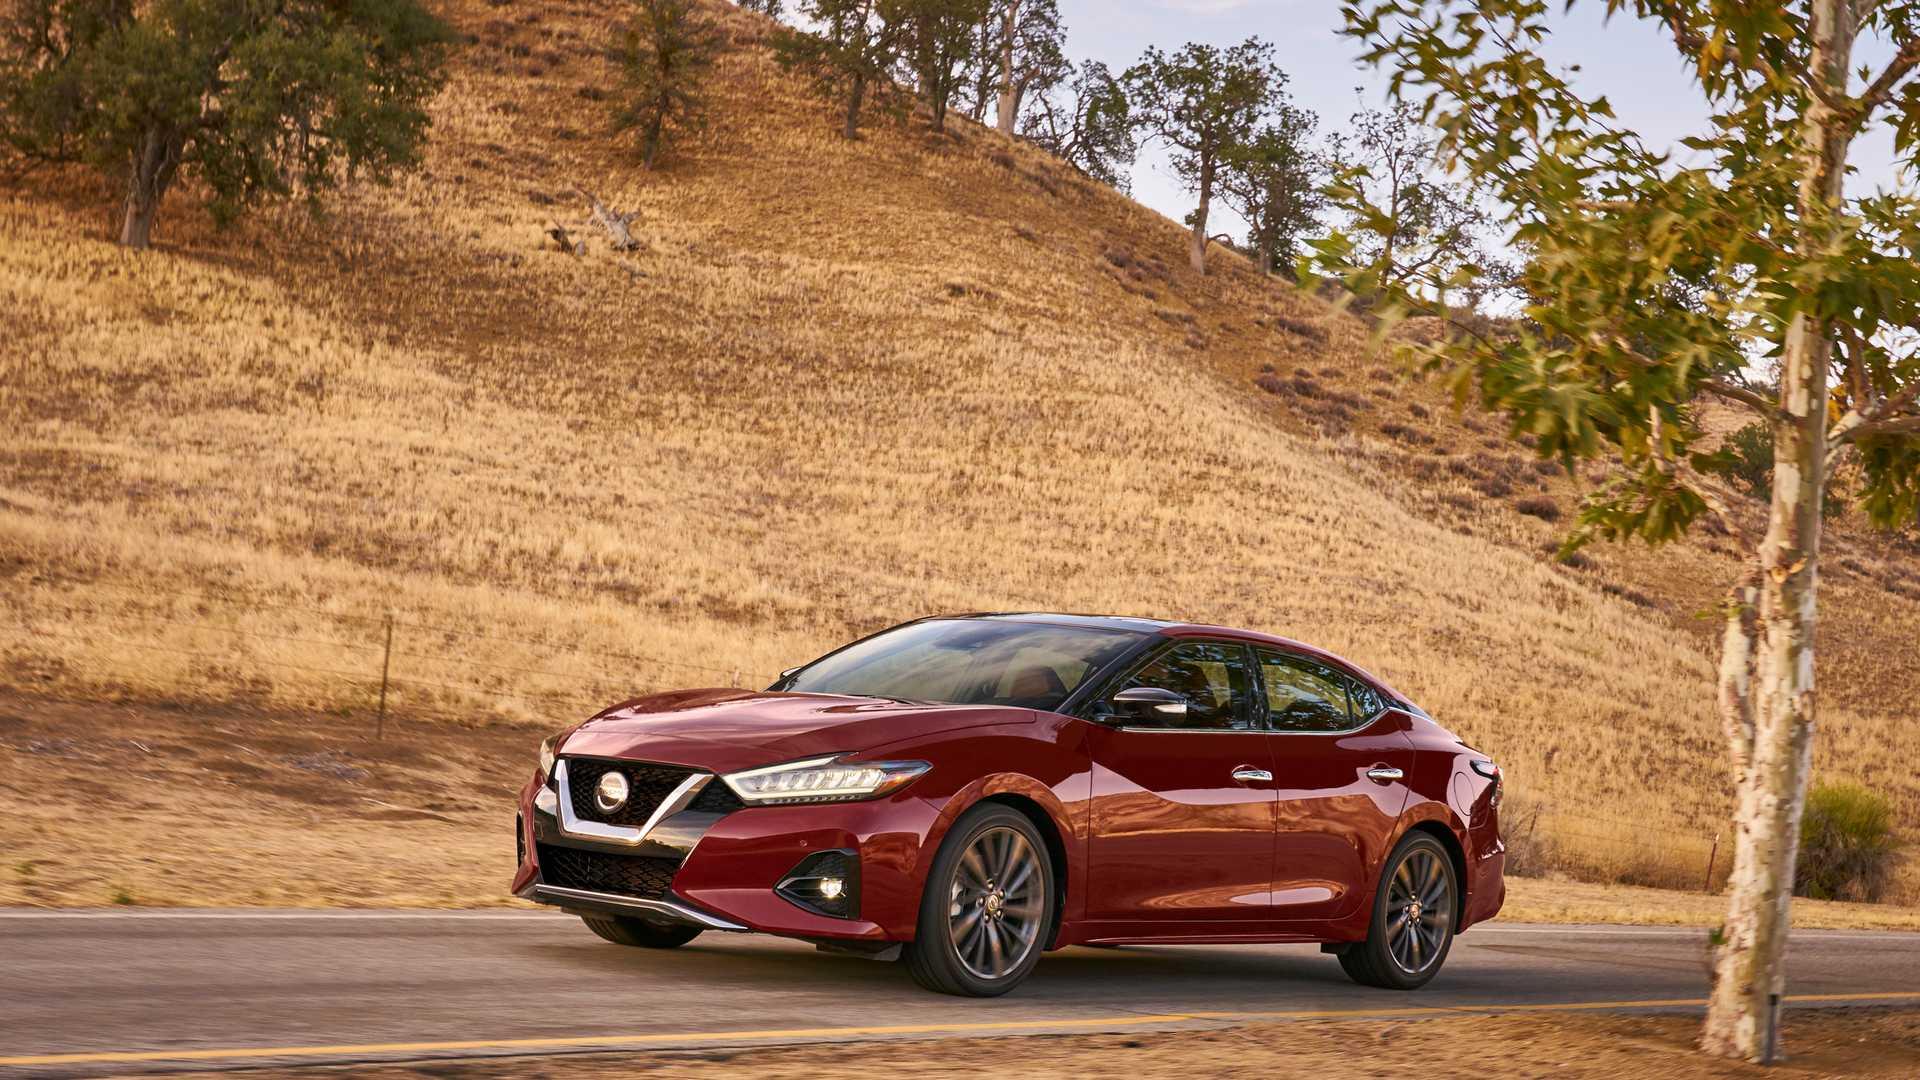 Nissan привёз в Лос-Анджелесе более безопасную Maxima 2